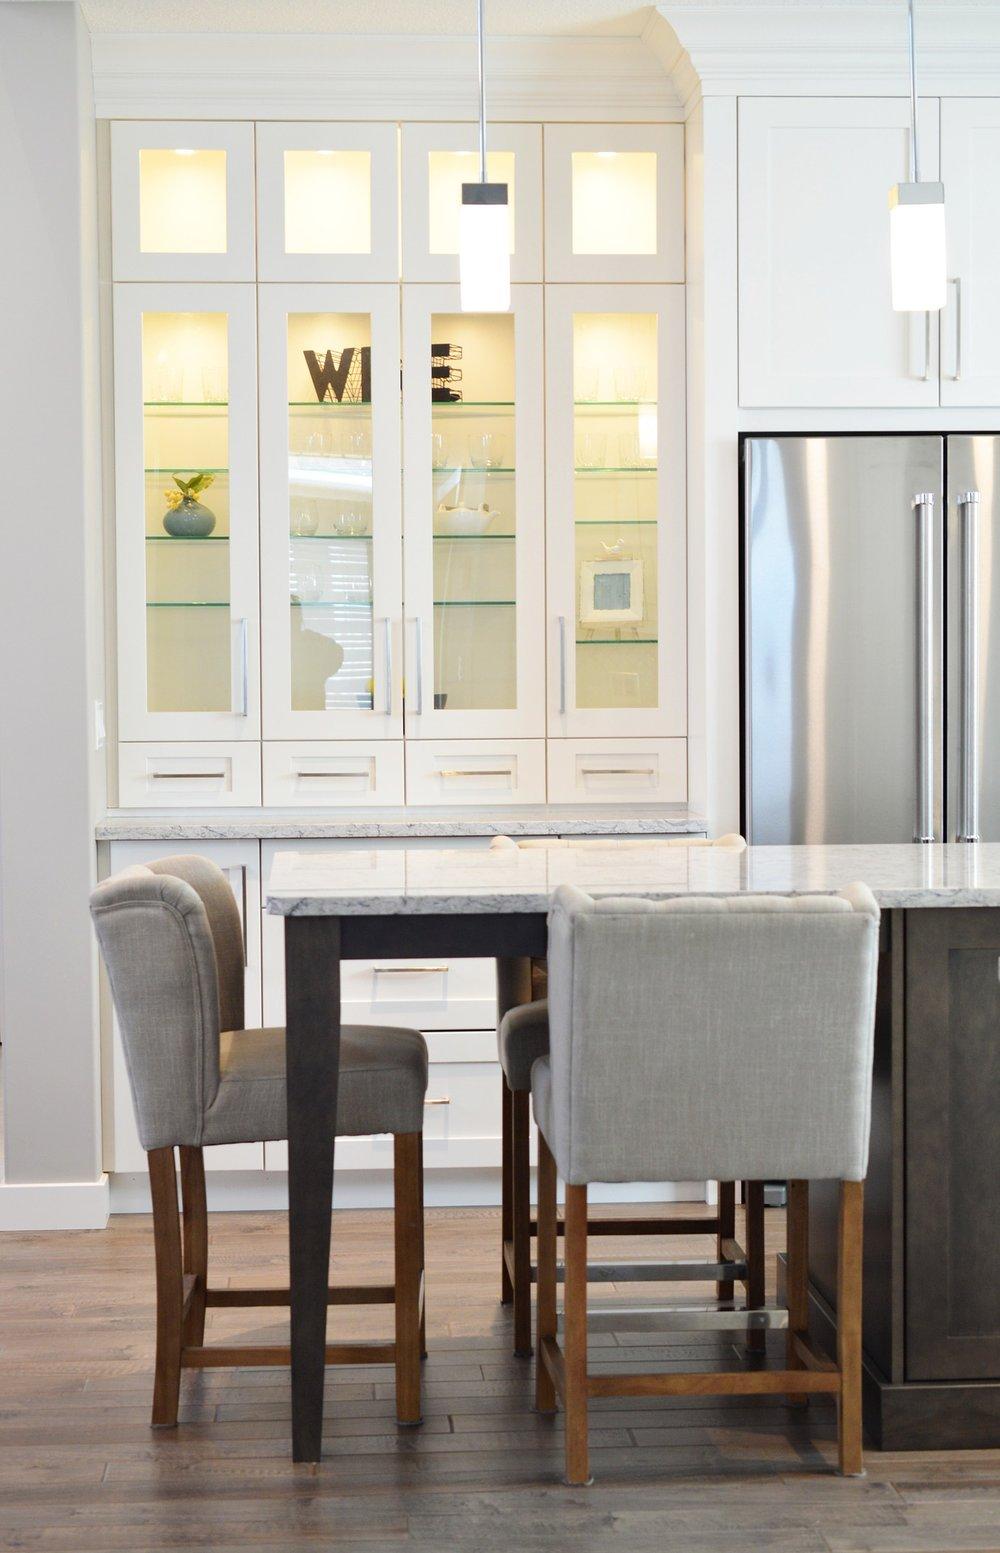 How To Design a Non-White Kitchen in a White Kitchen World